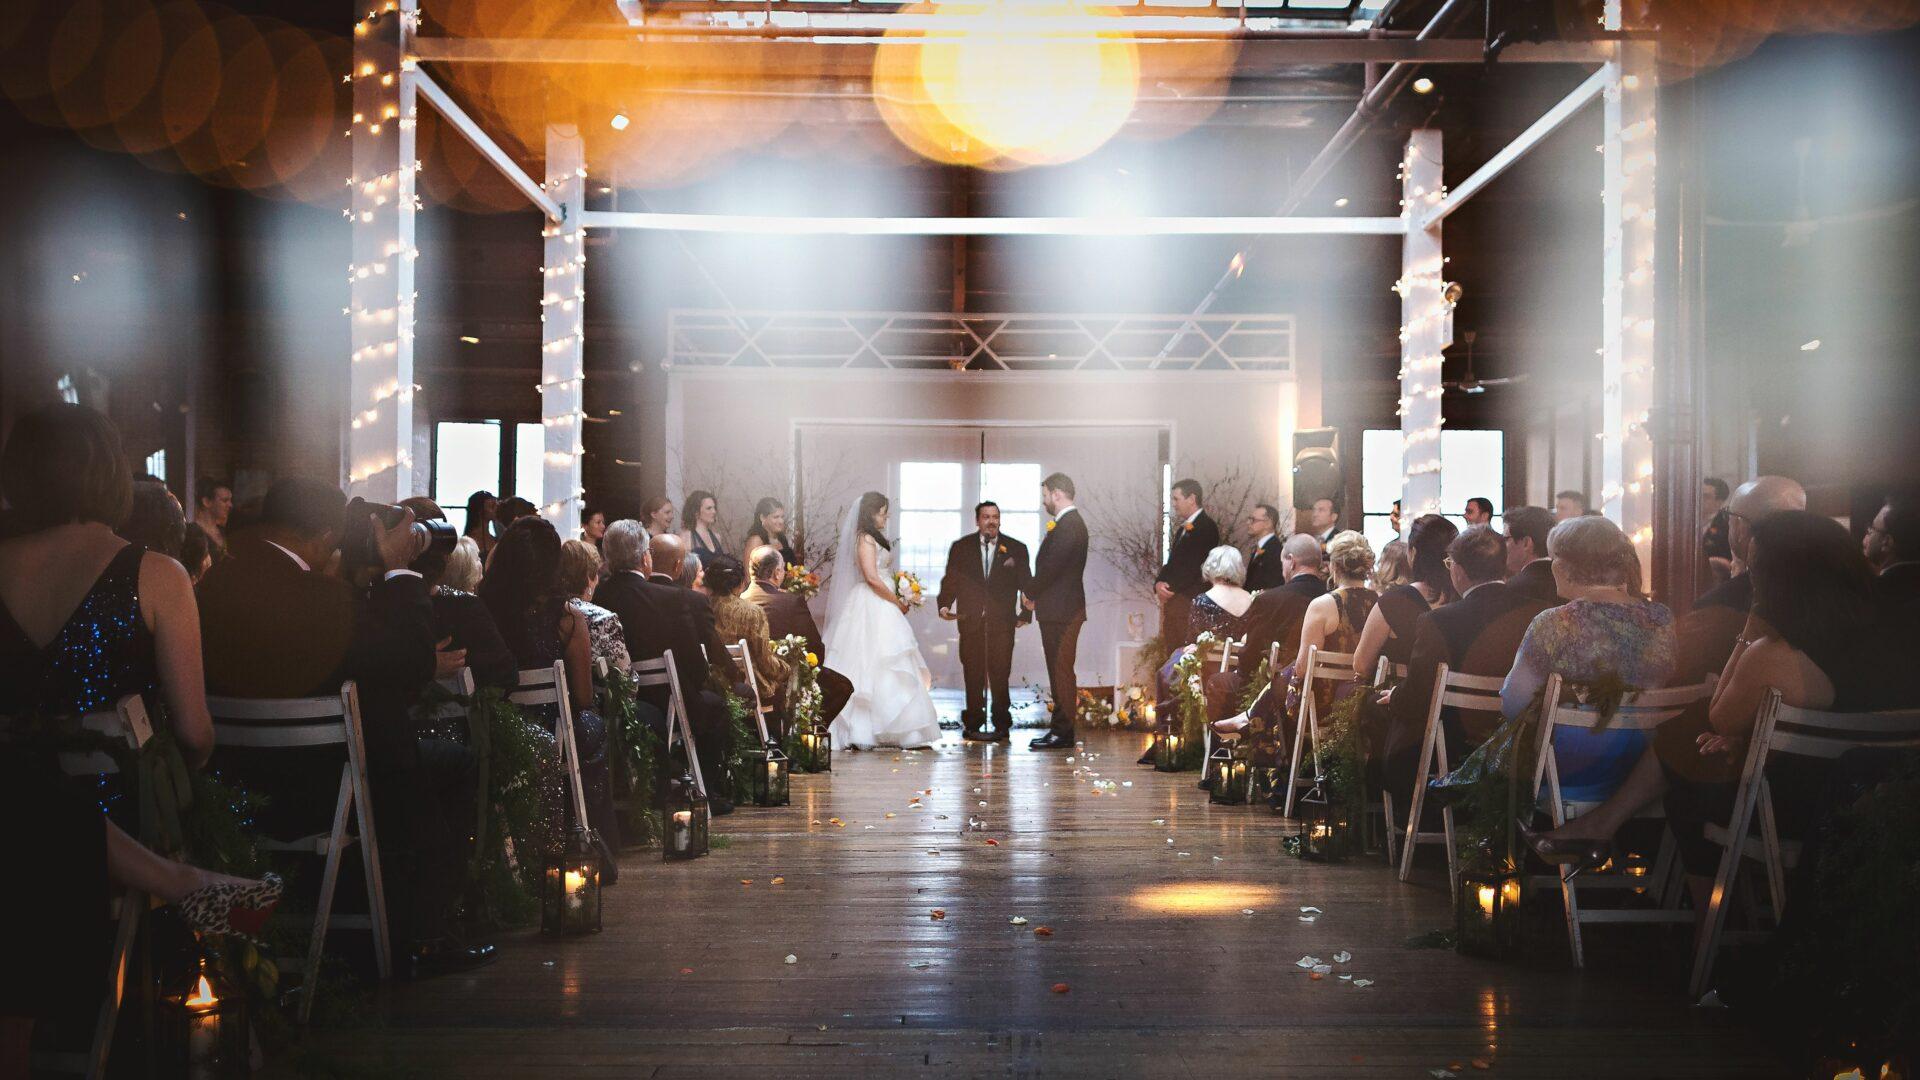 Magical wedding ceremony